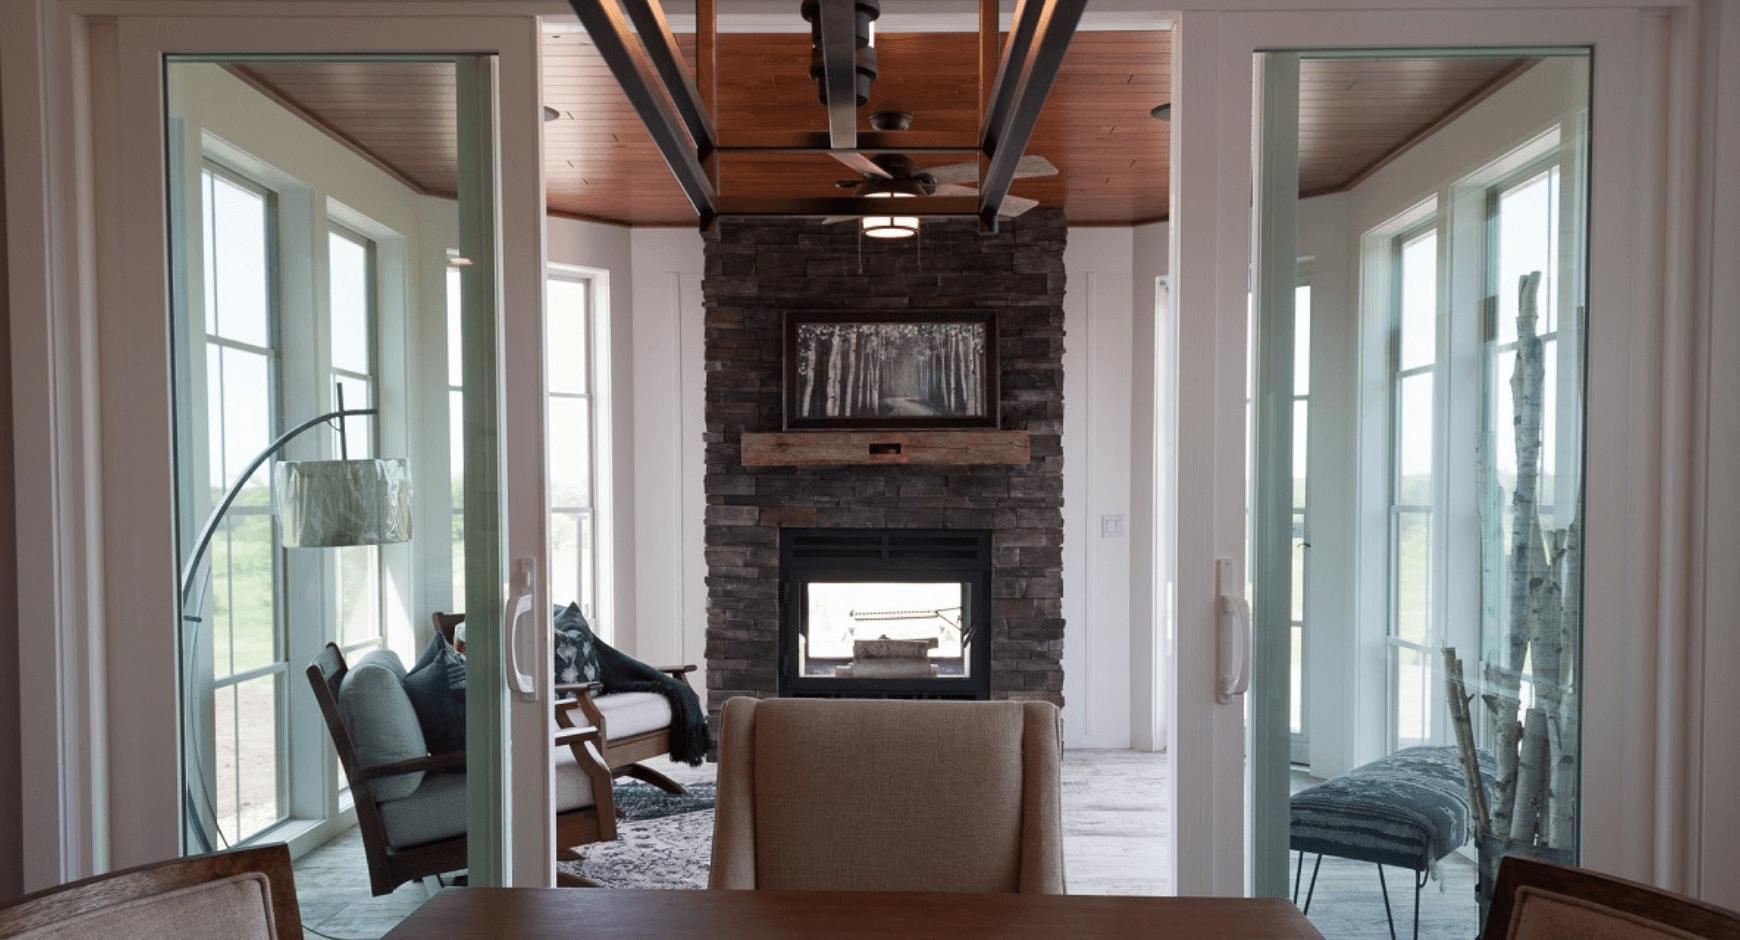 Floor to ceiling dry stacked stone veneer fireplace